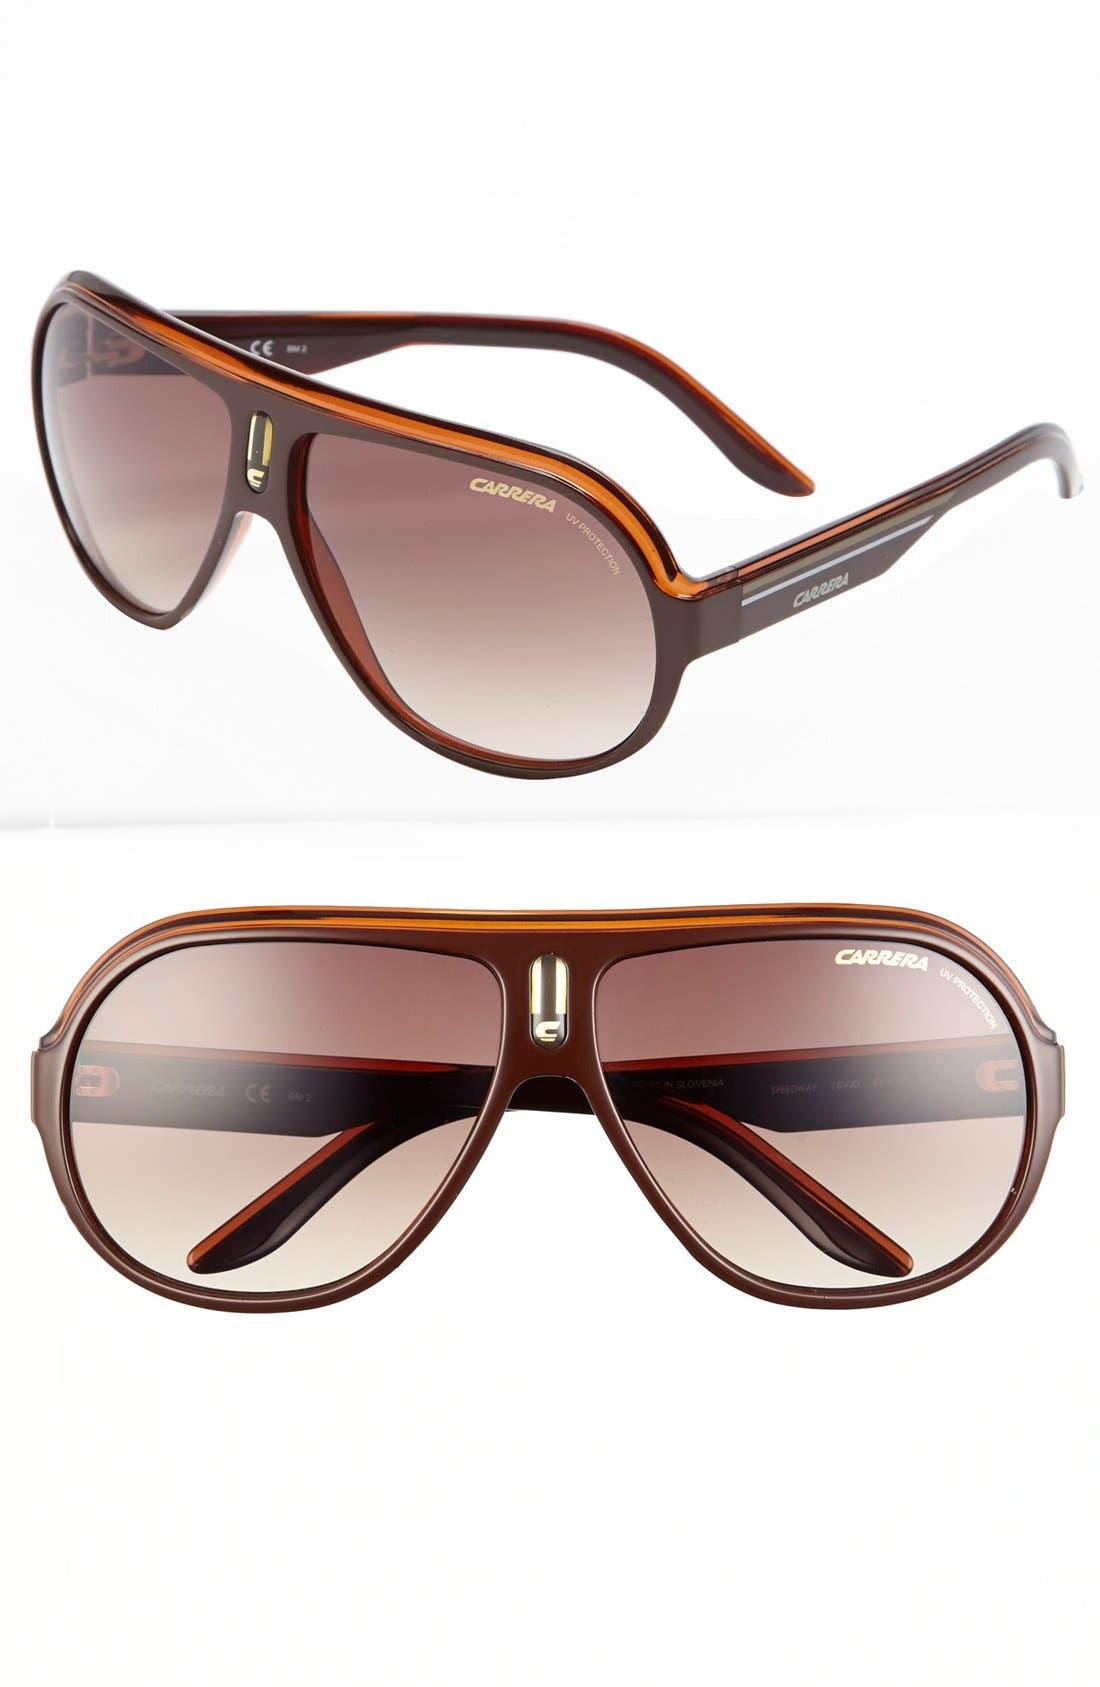 Alternate Image 1 Selected - Carrera Eyewear 'Speedway' 63mm Aviator Sunglasses